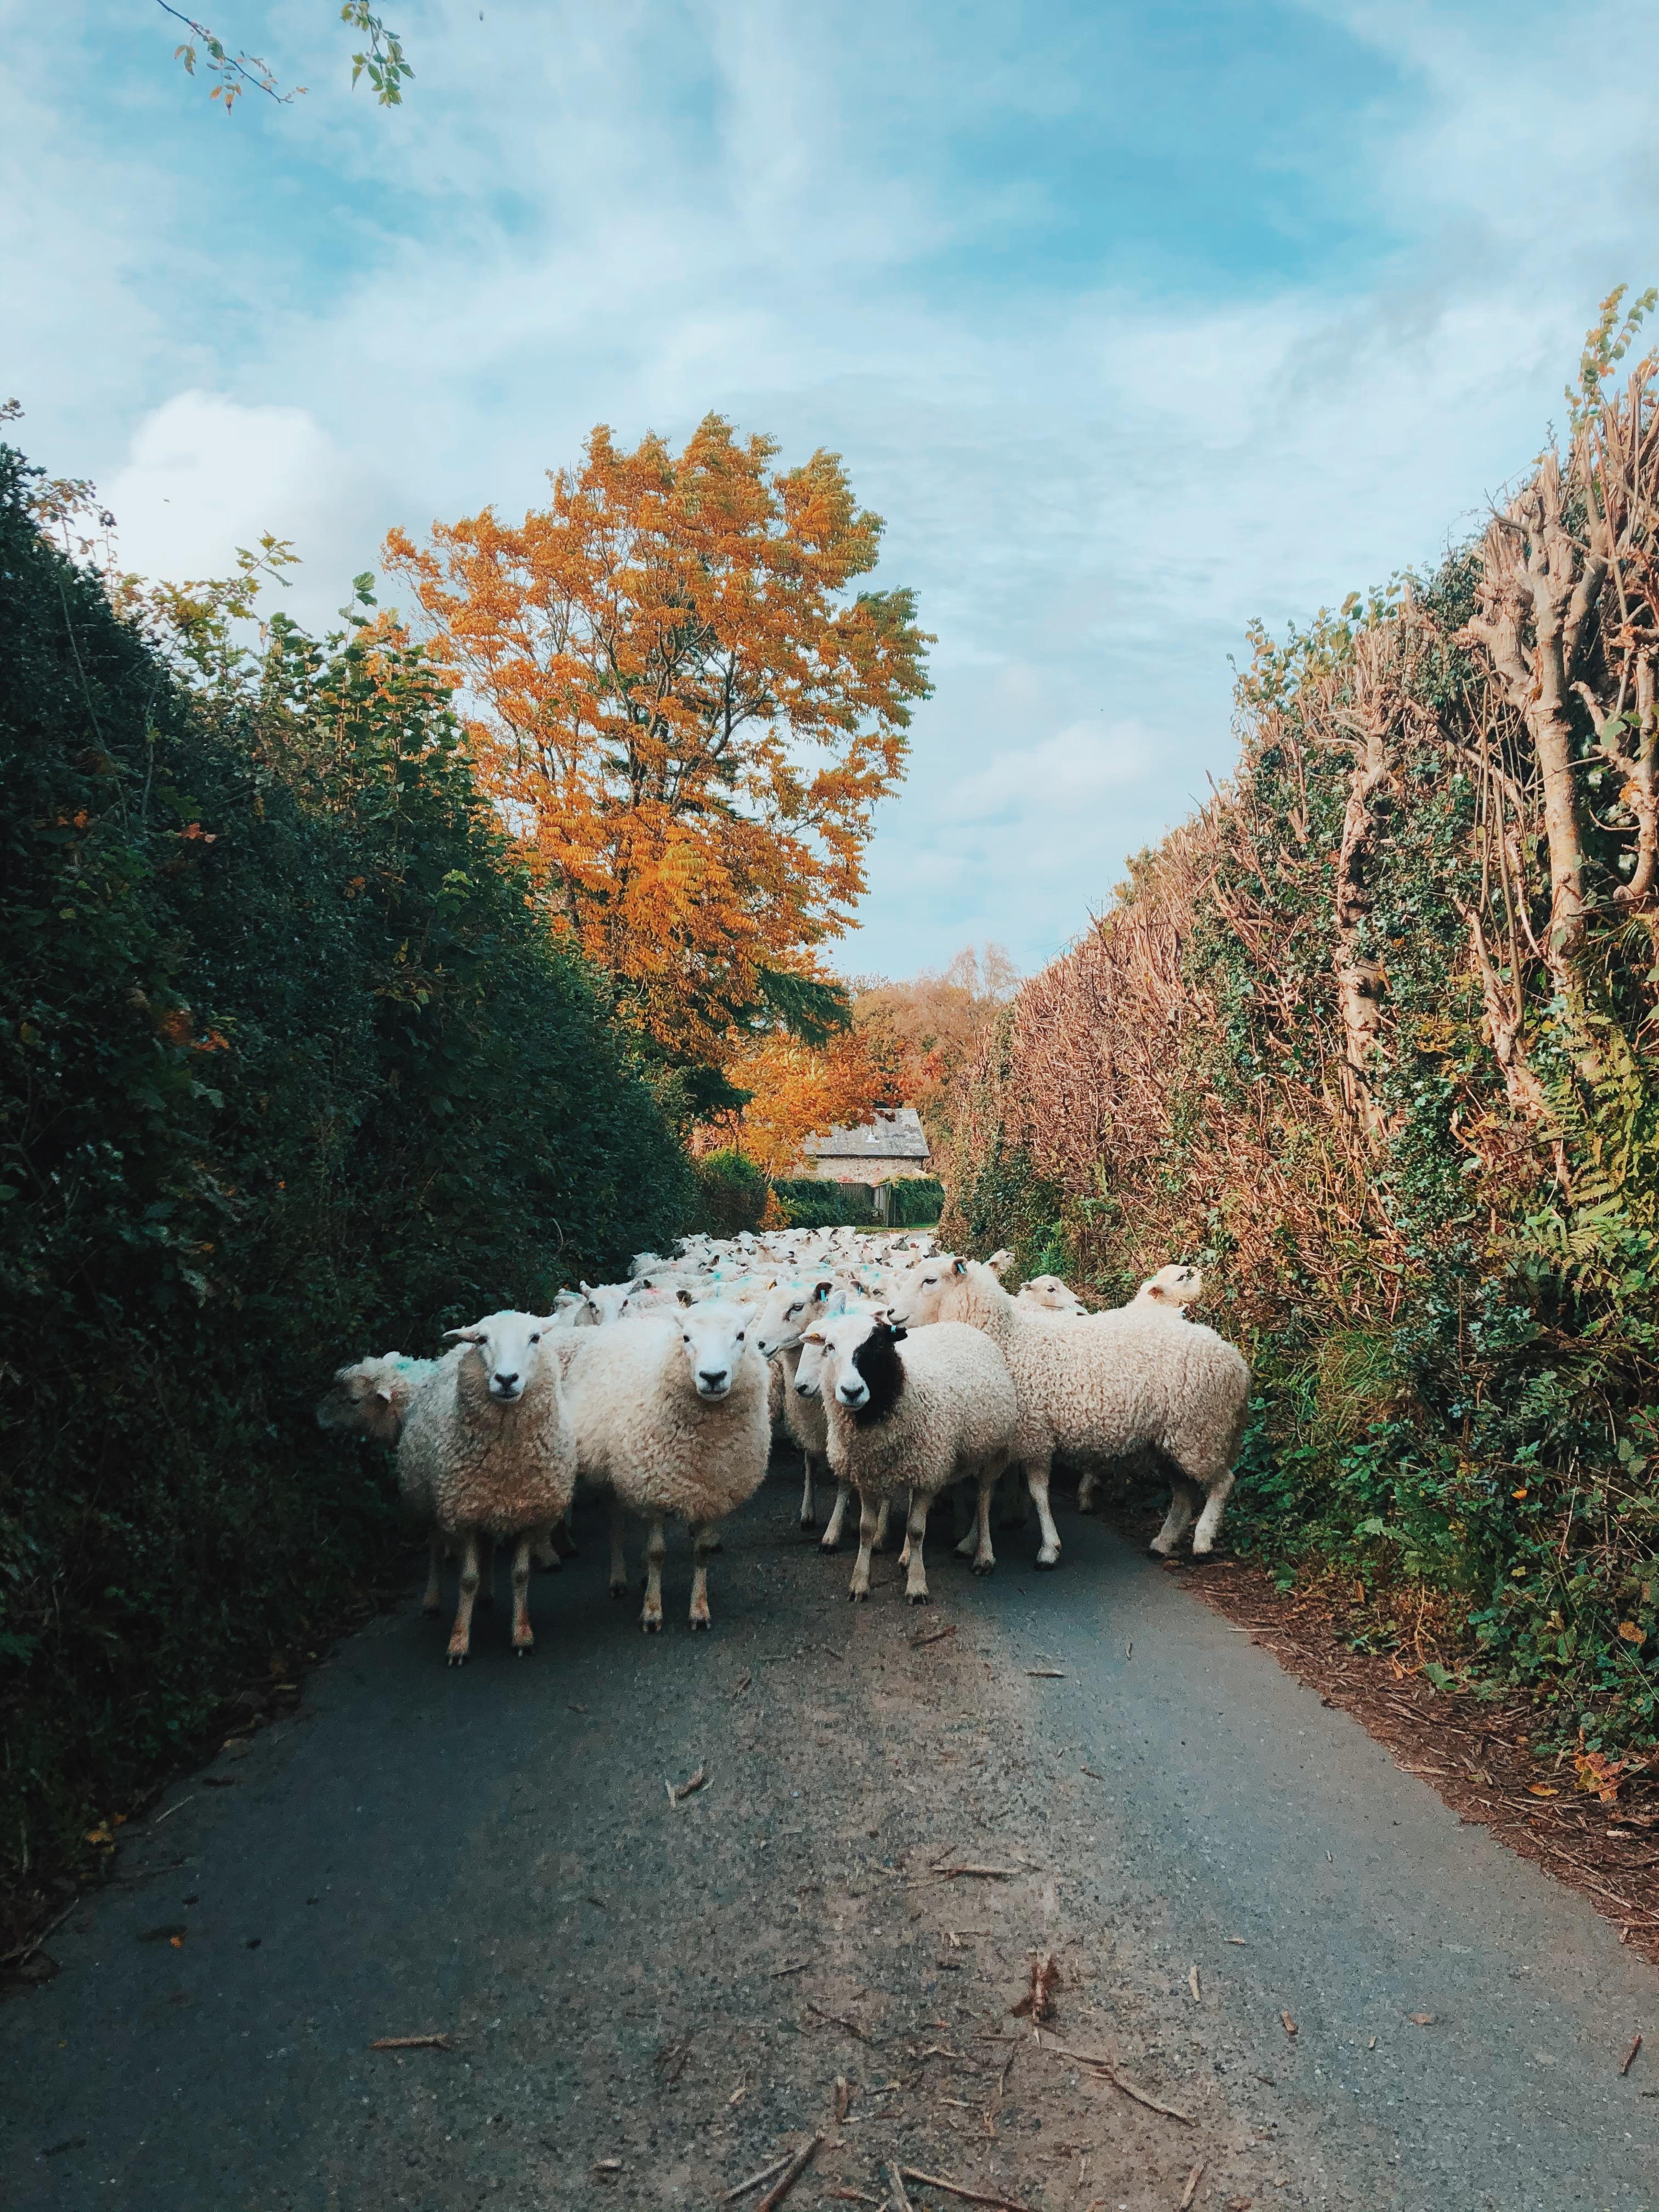 Walking our Whiteface Dartmoors down Devon lanes